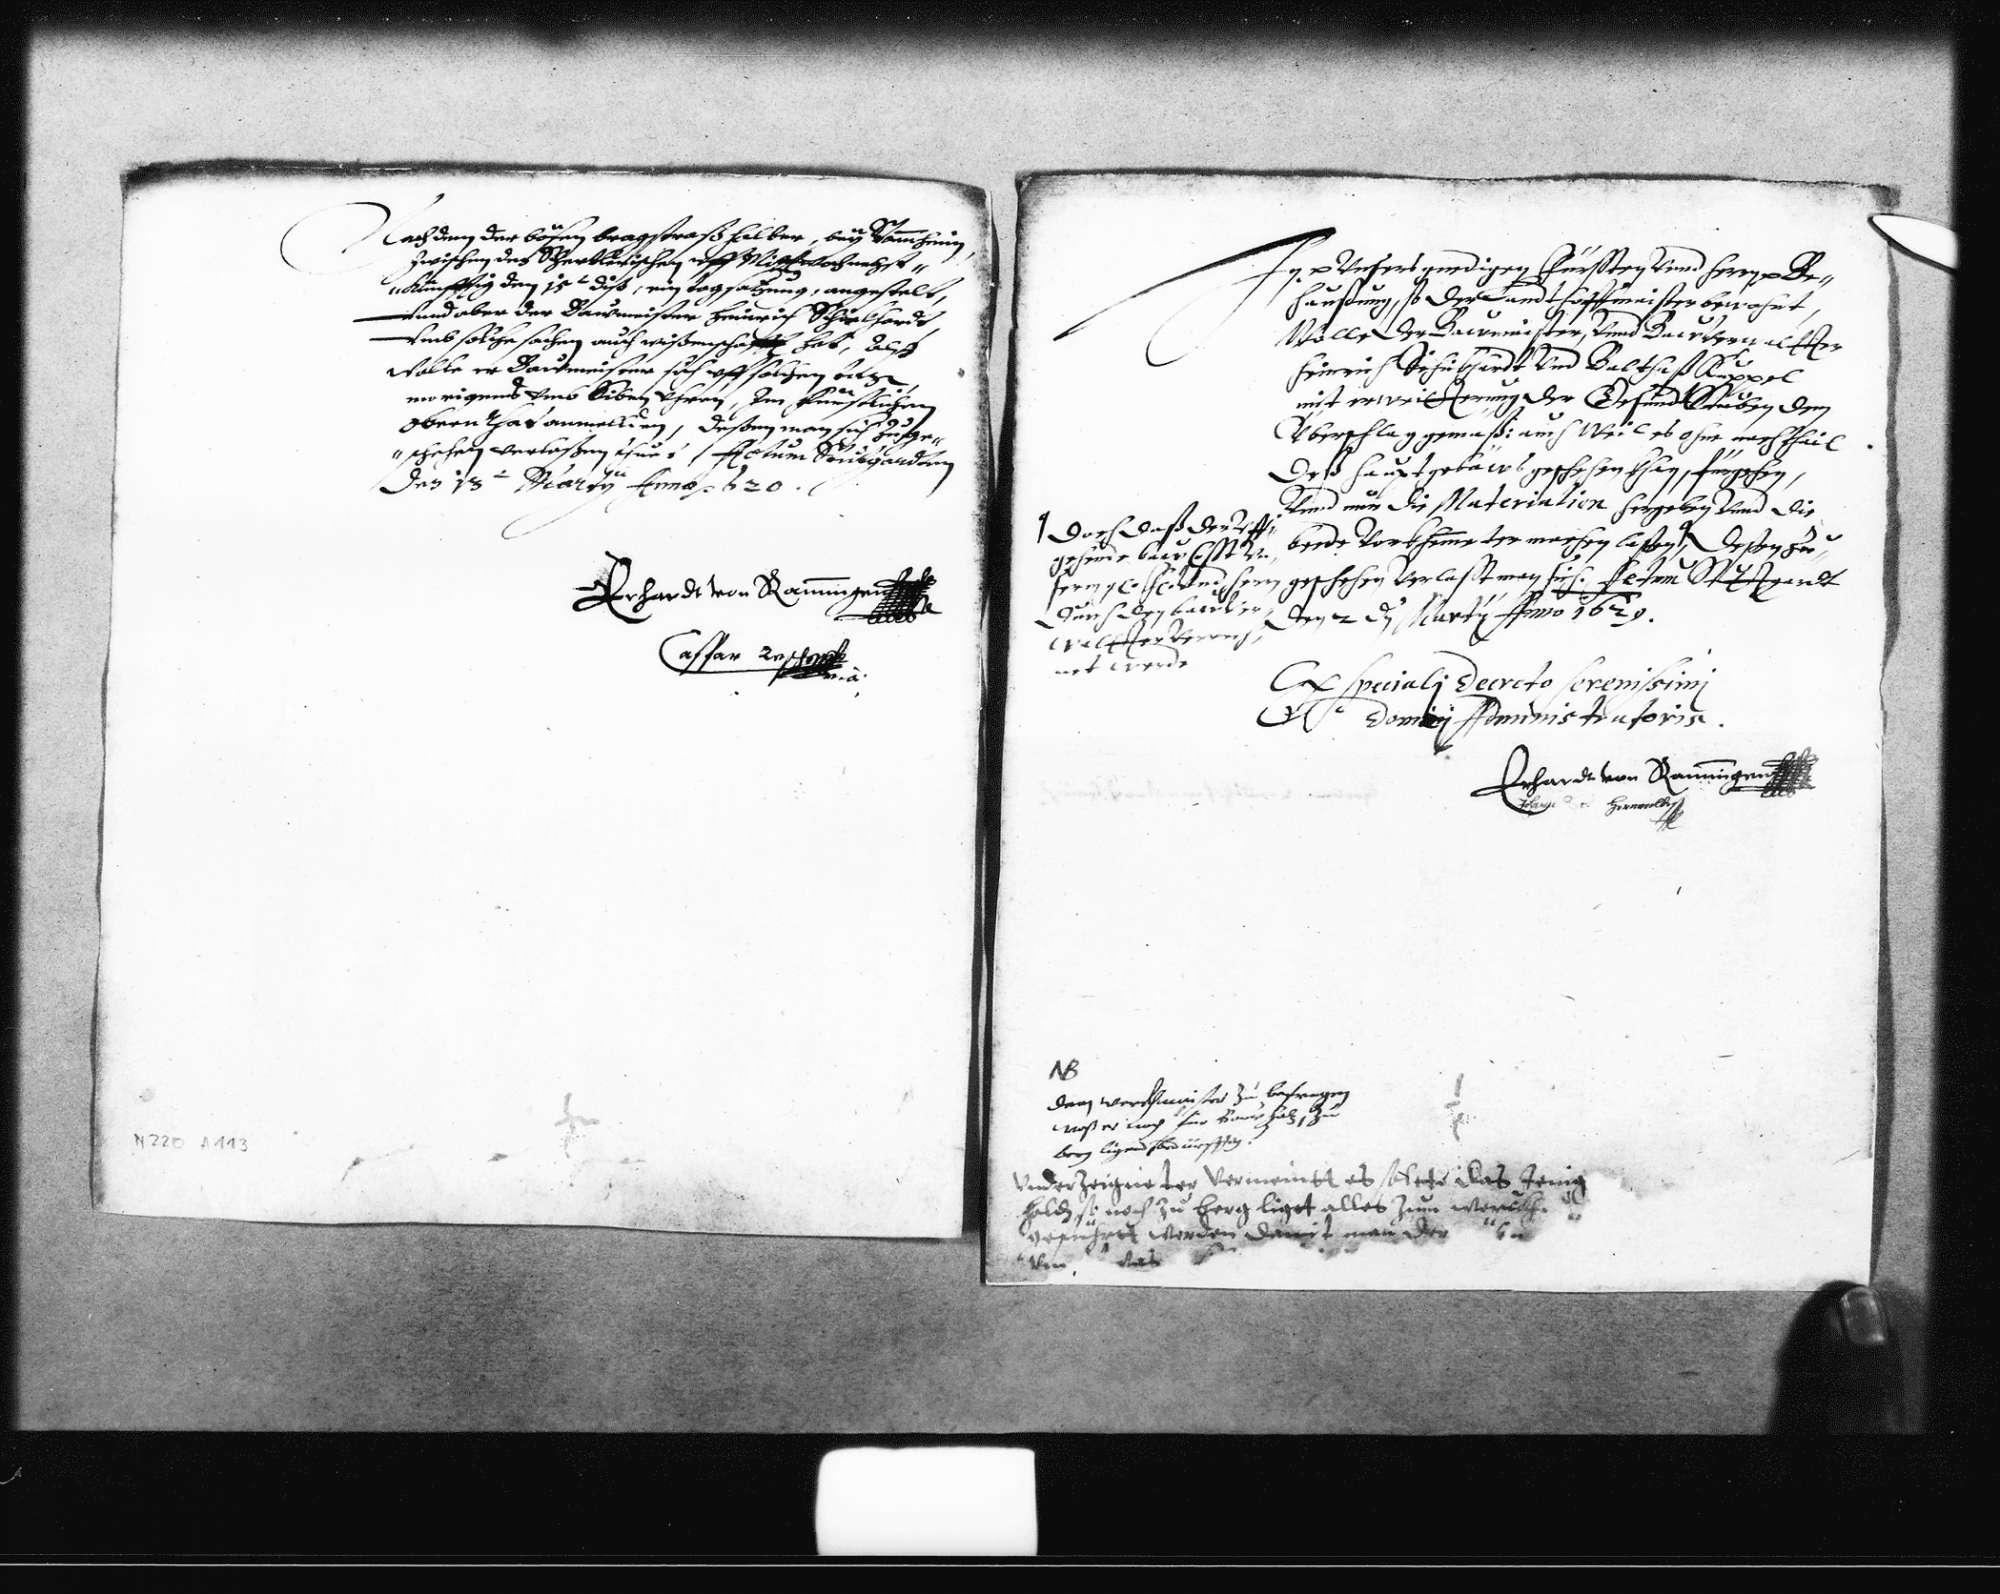 Reskripte der Rentkammer an Schickhardt, Bild 3